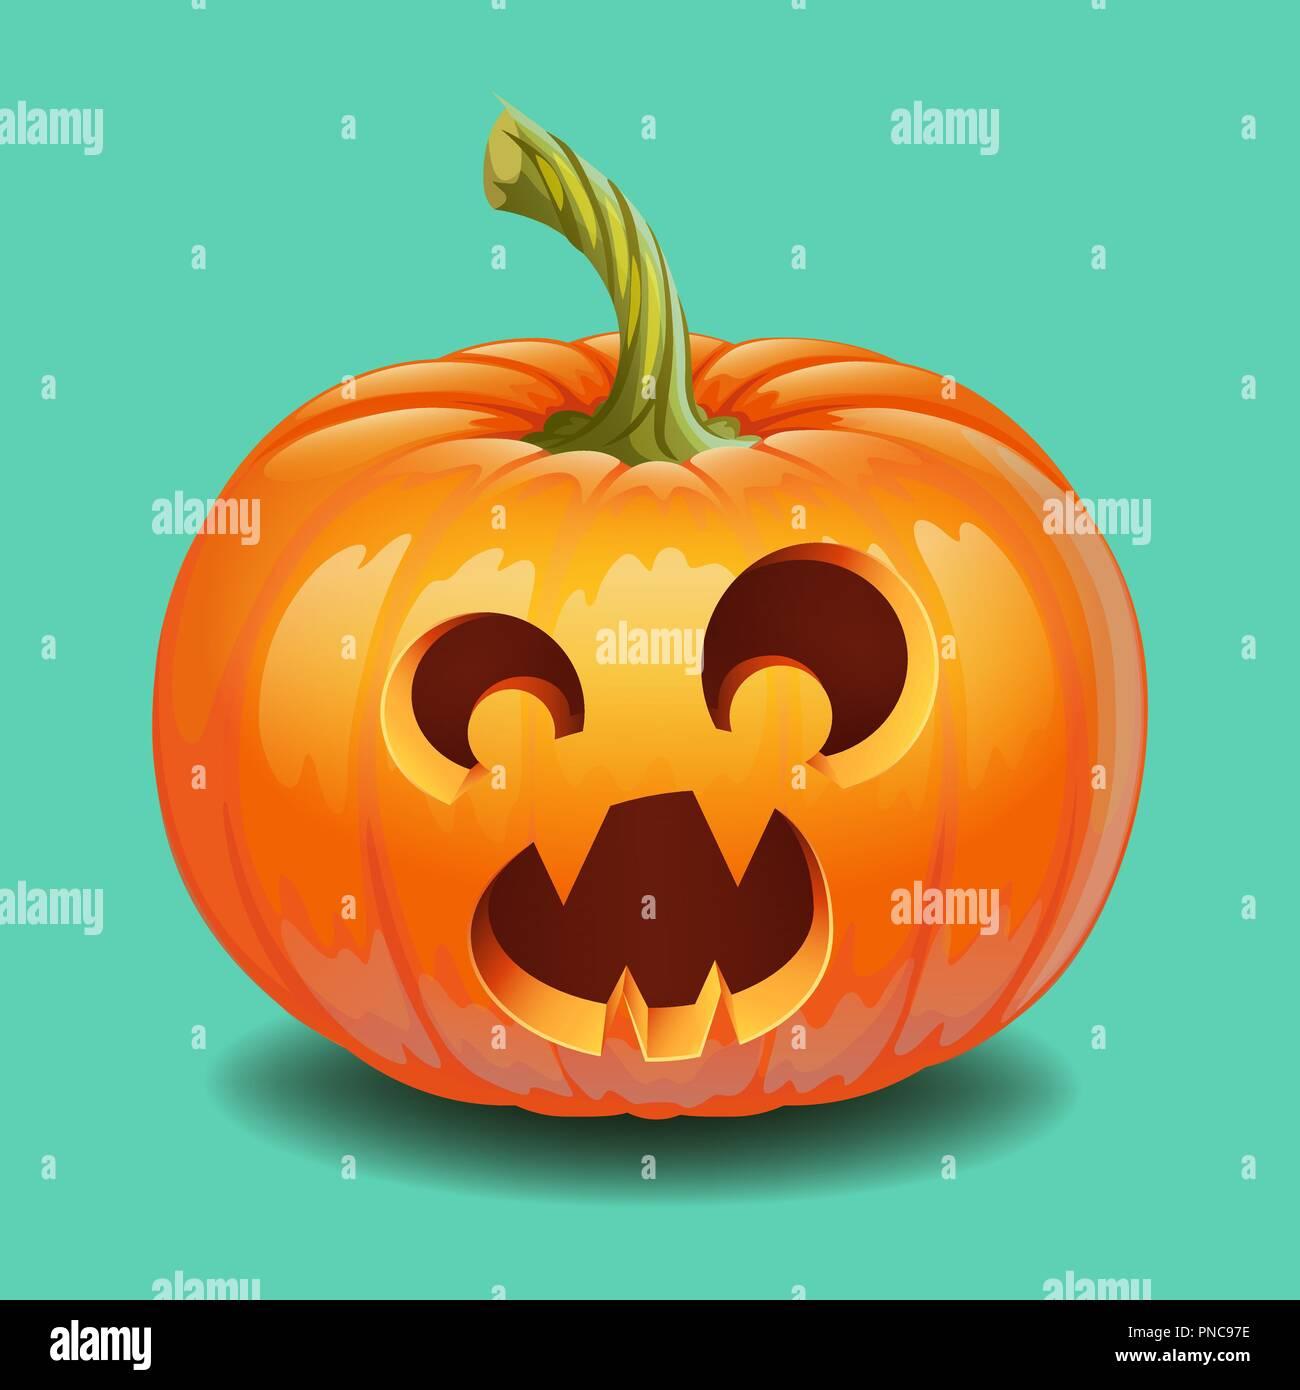 Beliebt Halloween Kürbis Lustig   Happy Halloween Kürbis Grimasse Lustige ZC61